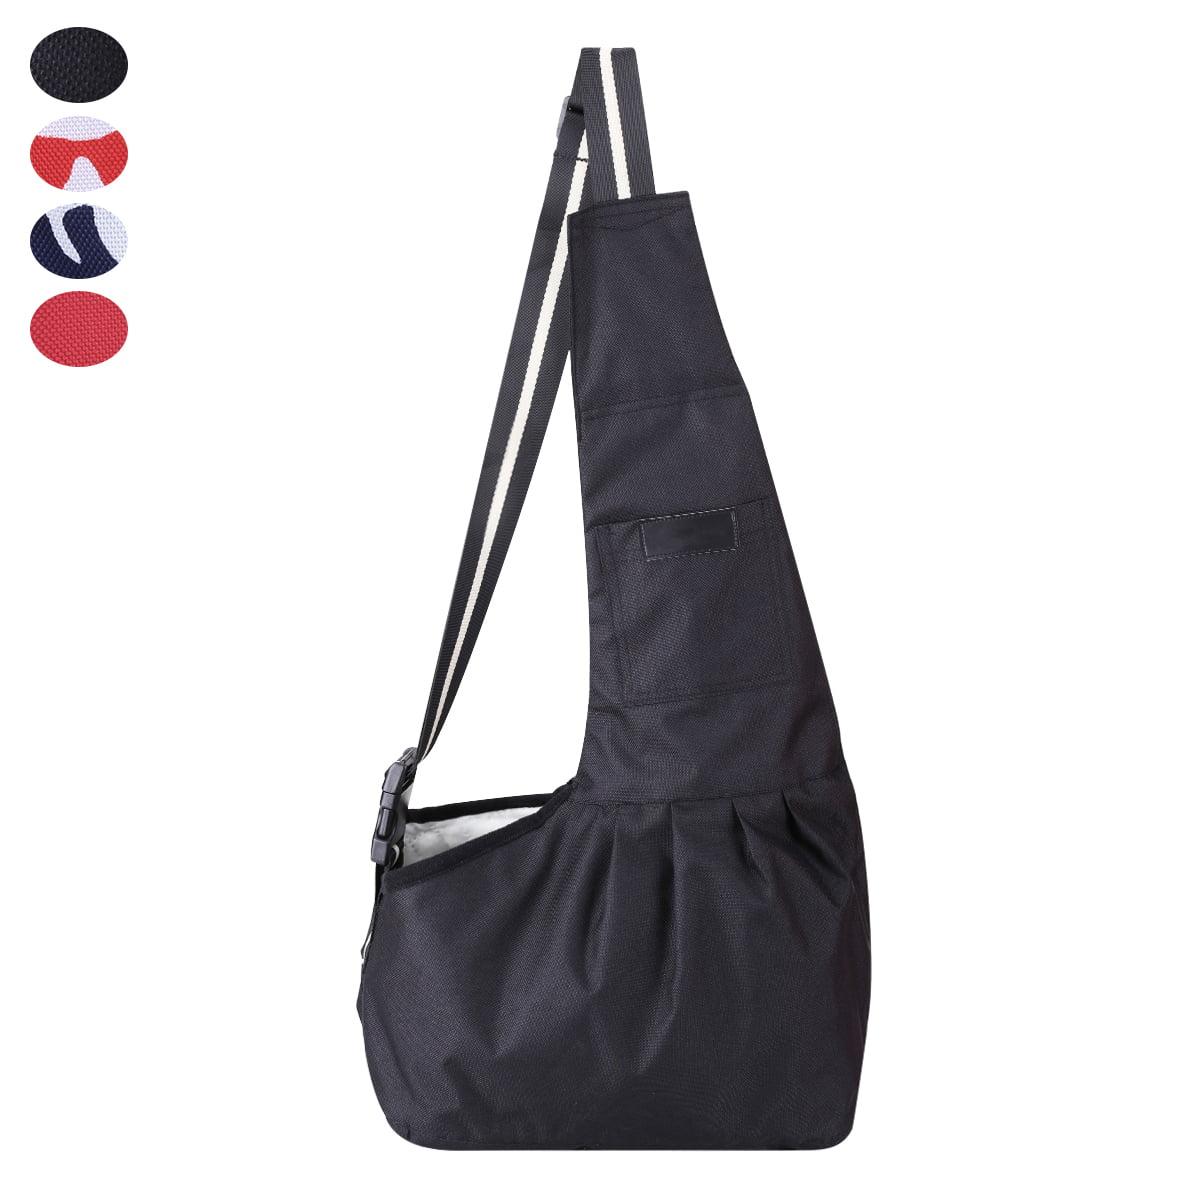 Docamor Pet & Dog Sling Carrier Adjustable Puppy Sling Bag Small Dogs Cats Outdoor Shoulder Carrier Bag Travel Pouch for Pets